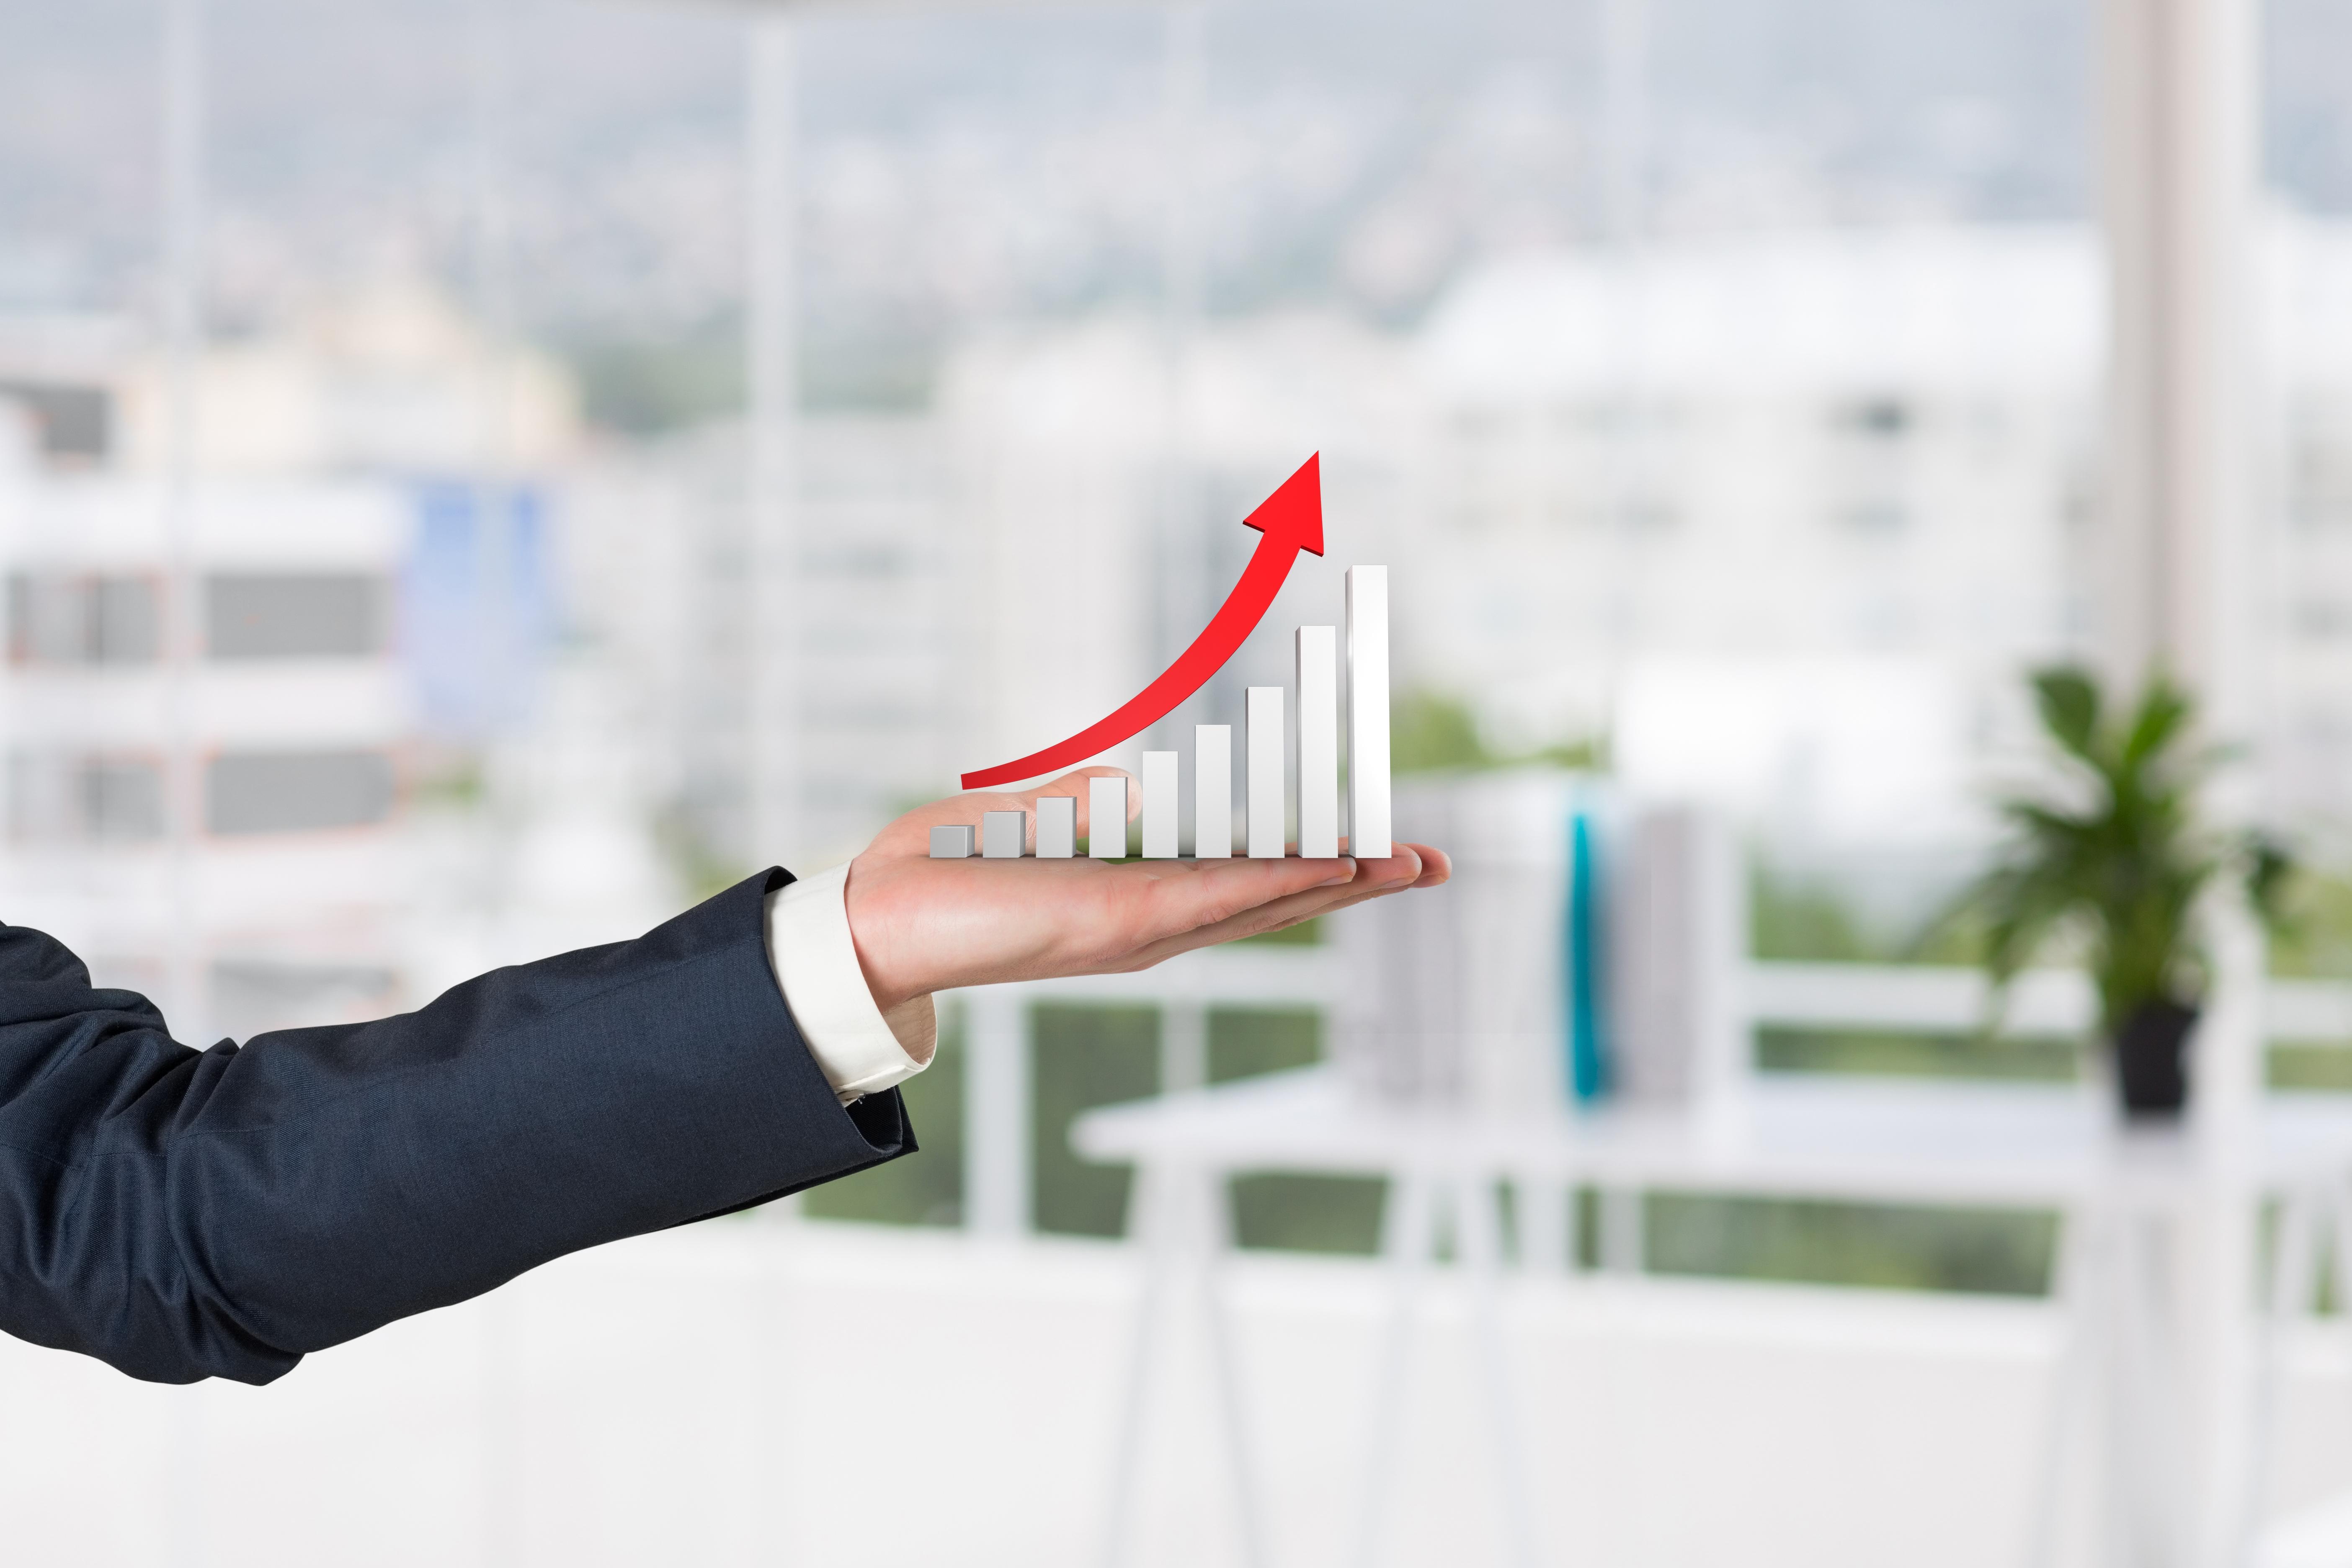 identificar oportunidades de novos negócios